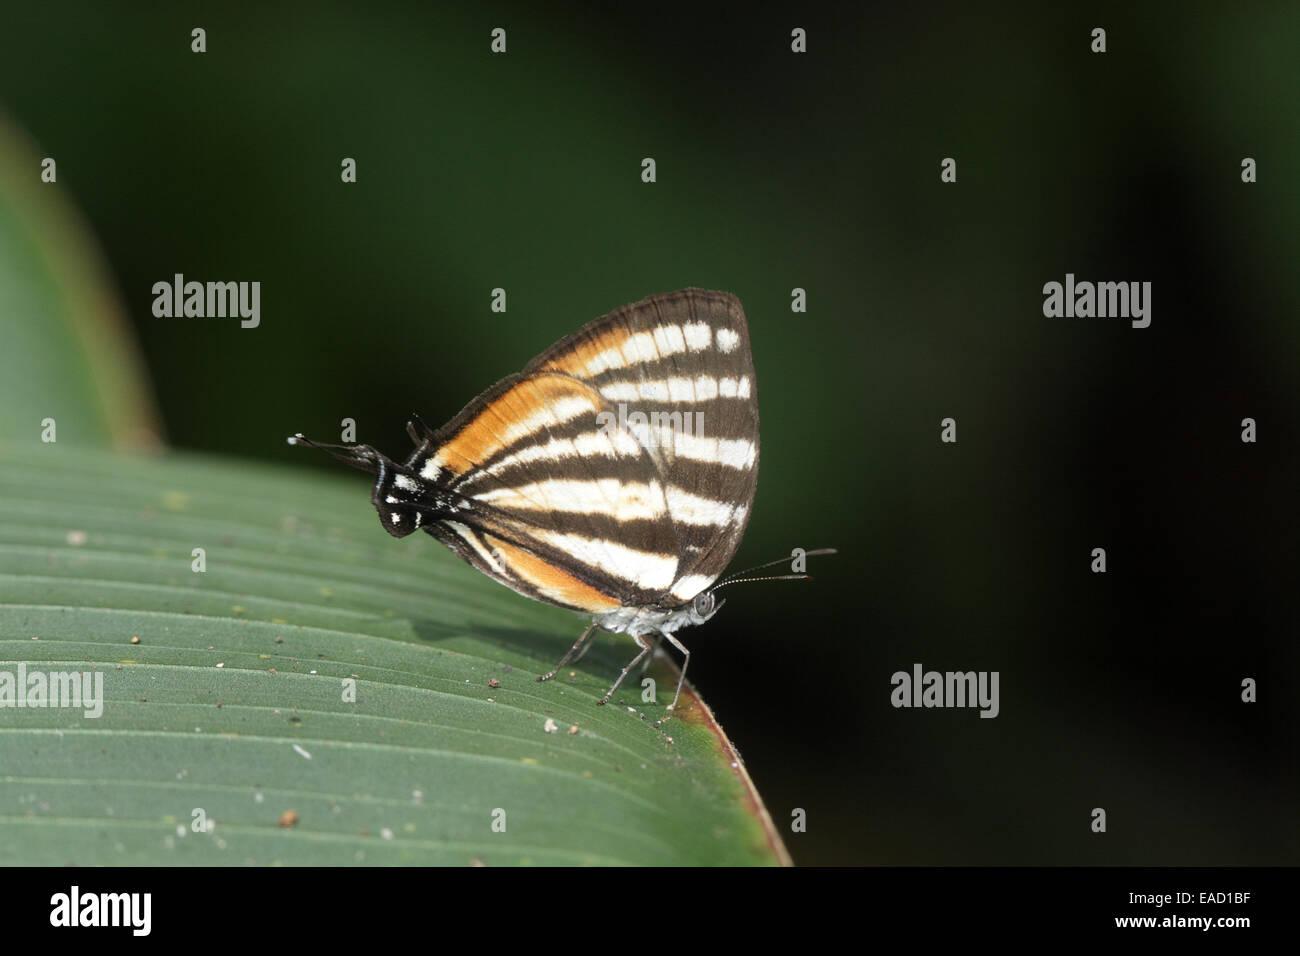 Stripestreak Butterlfy, Arawacus lincoides - Stock Image